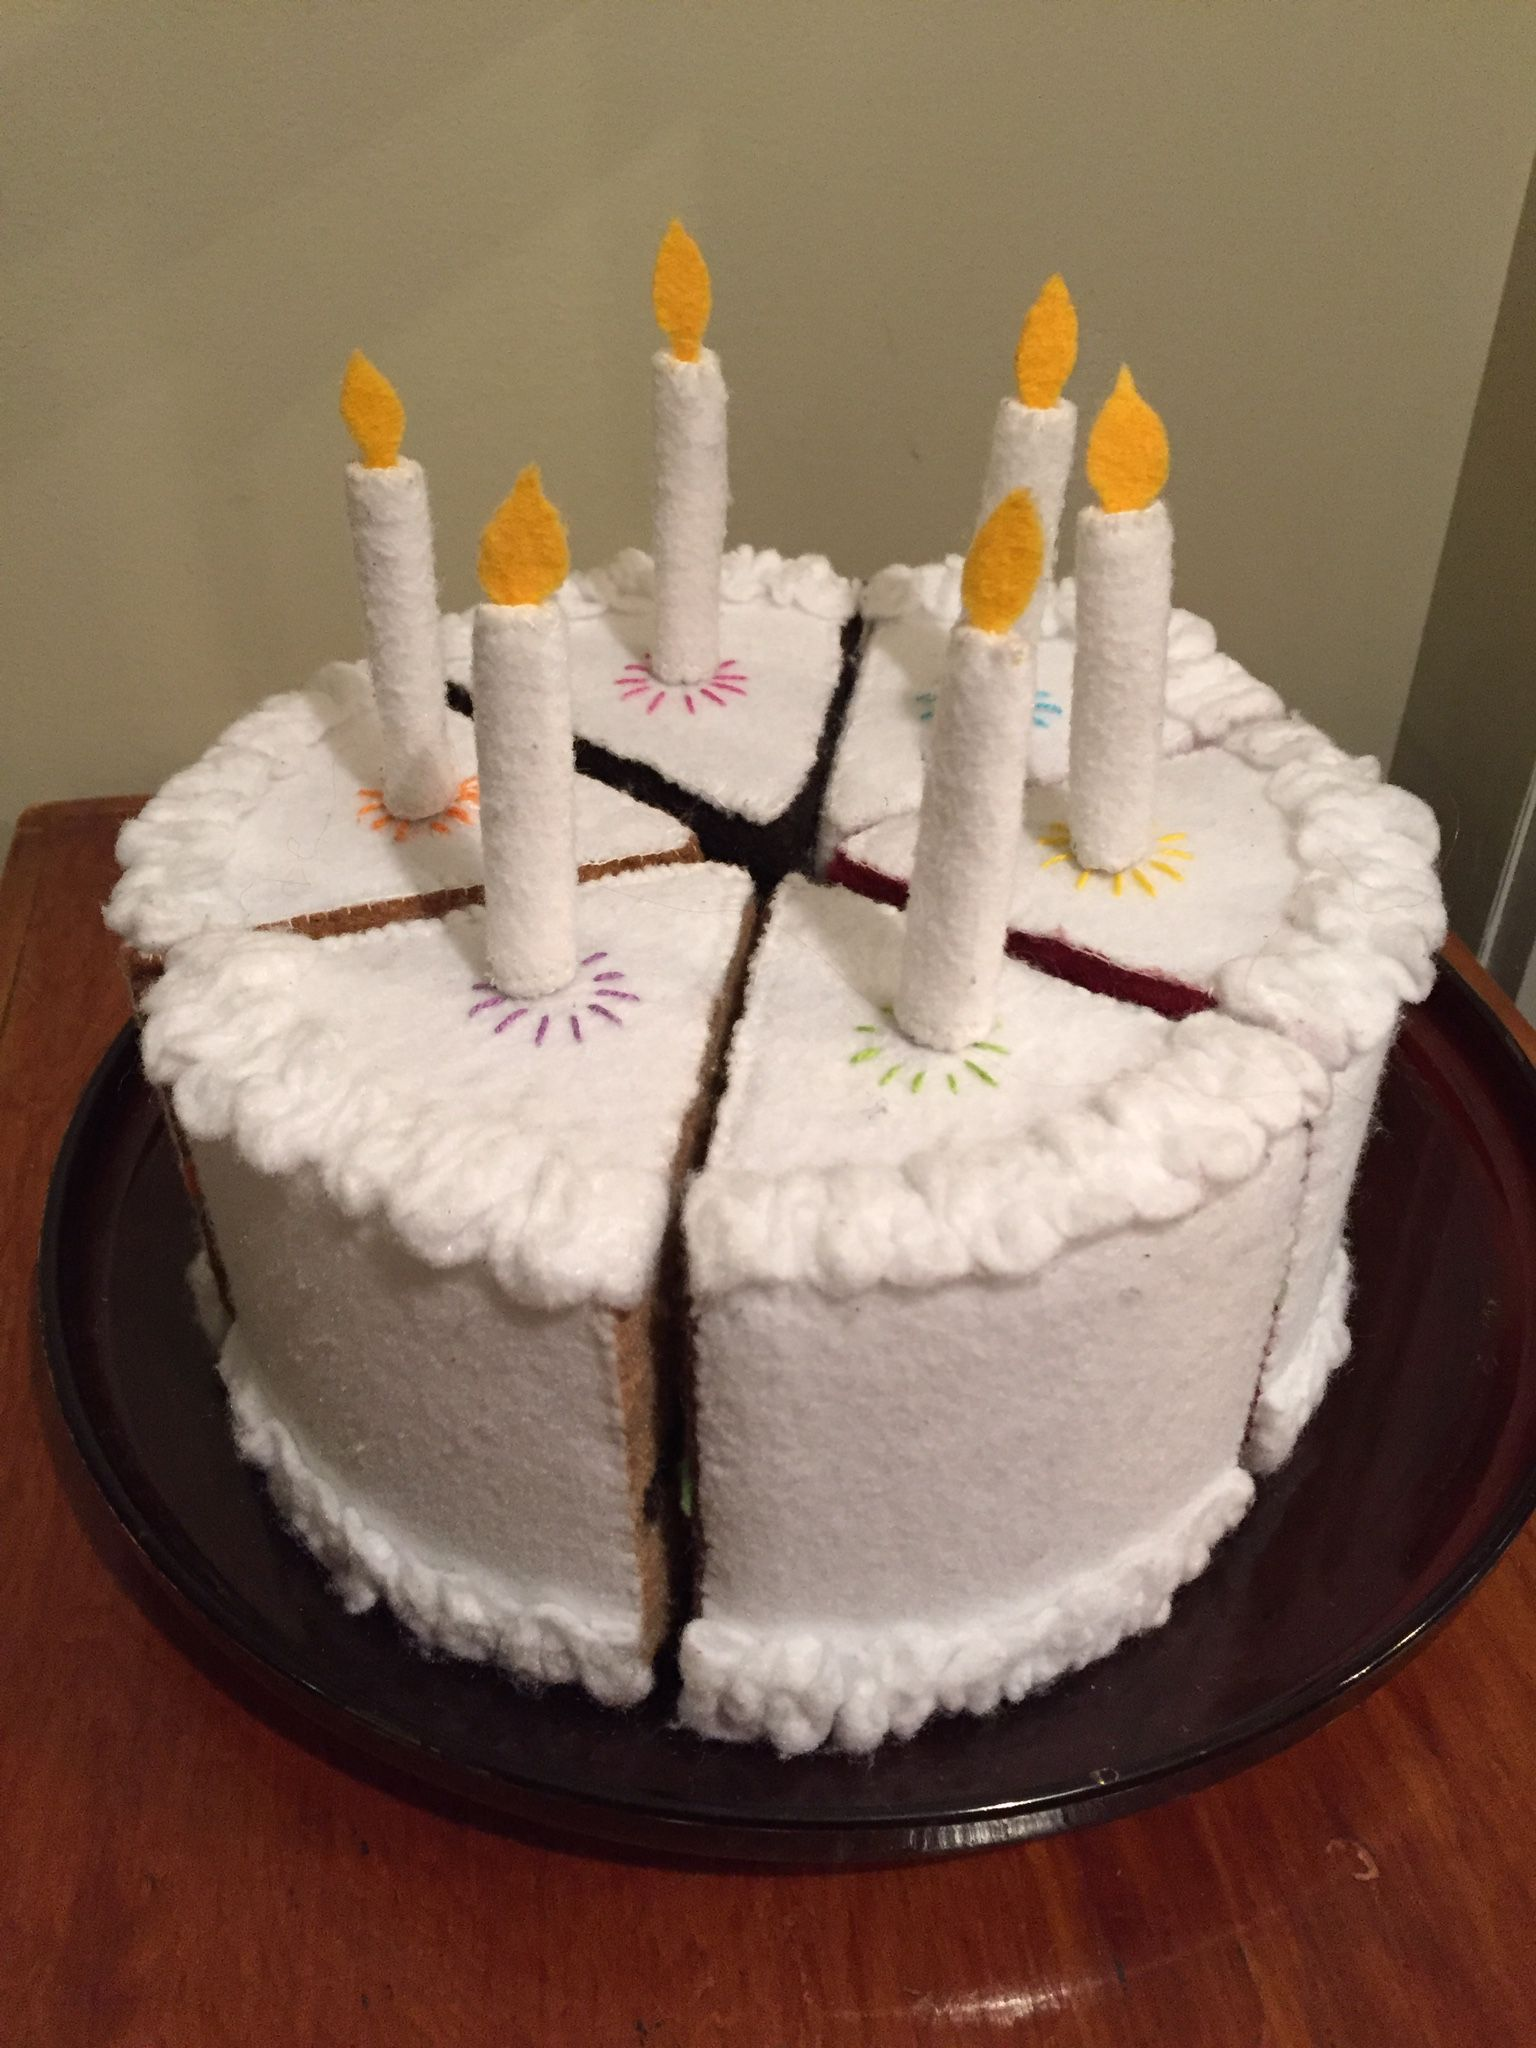 Felt CUSTOM birthday cake with magnetic candles Felt fun